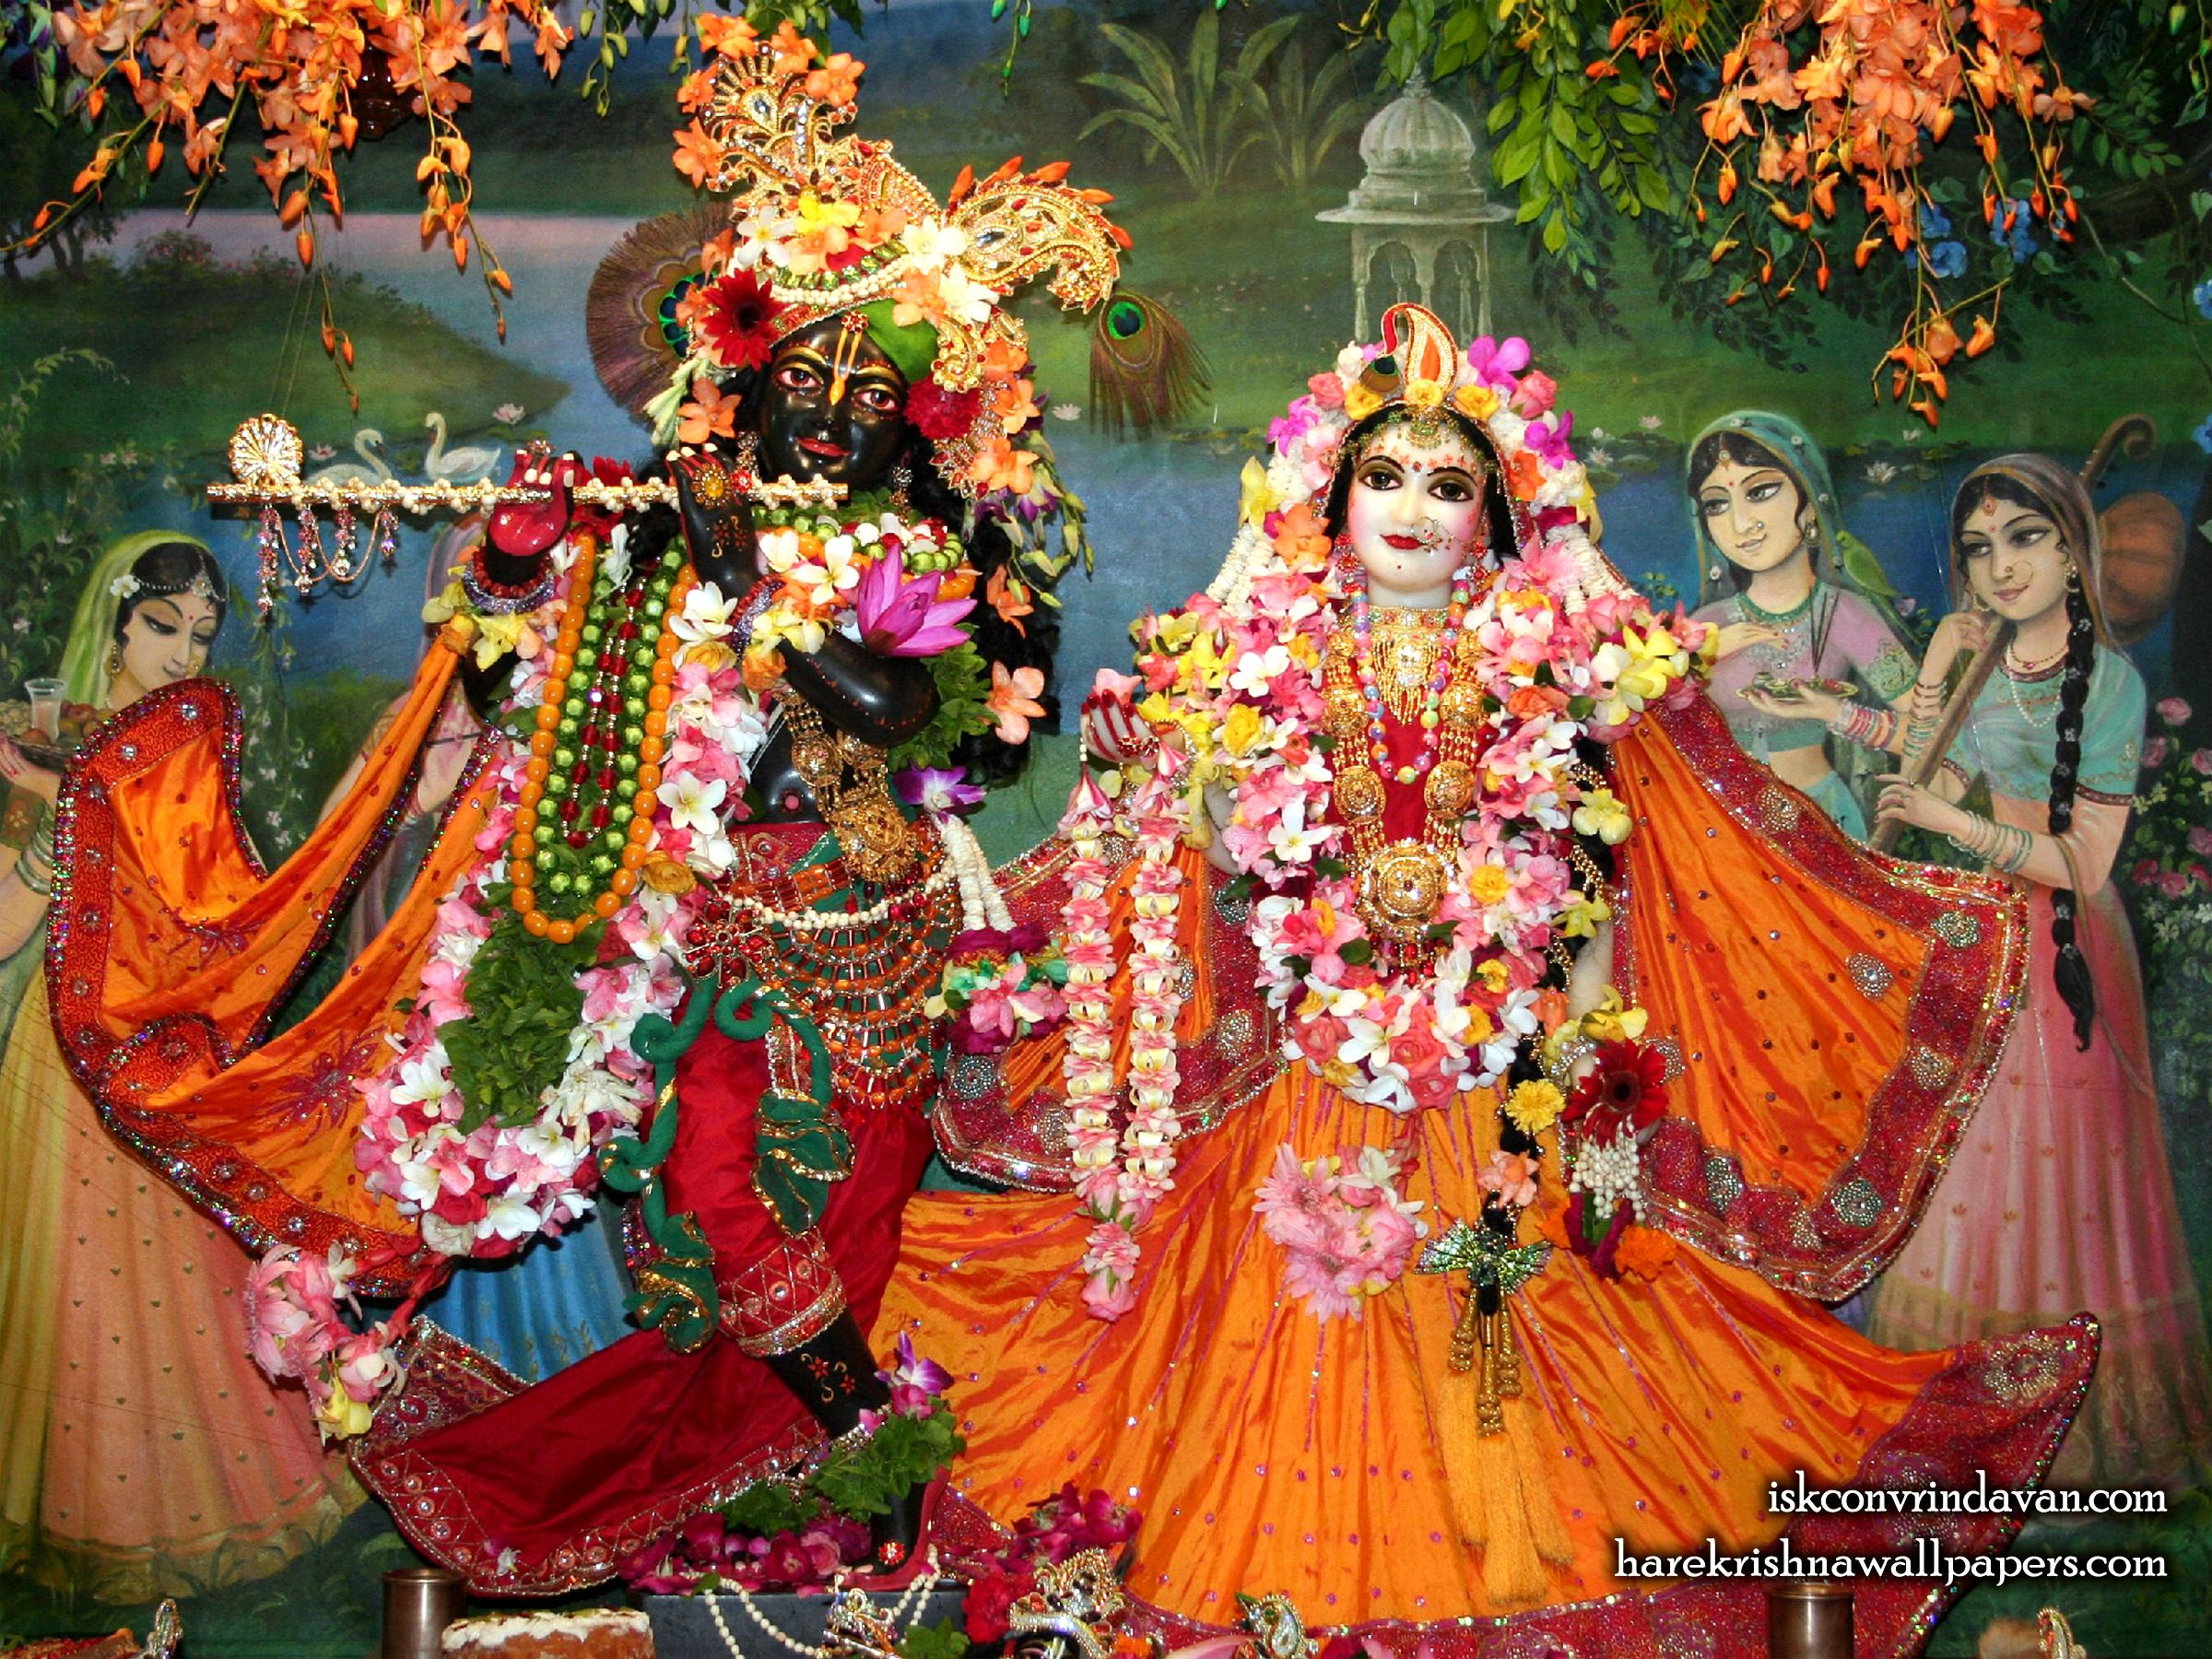 Sri Sri Radha Shyamsundar Wallpaper (017) Size 2400x1800 Download